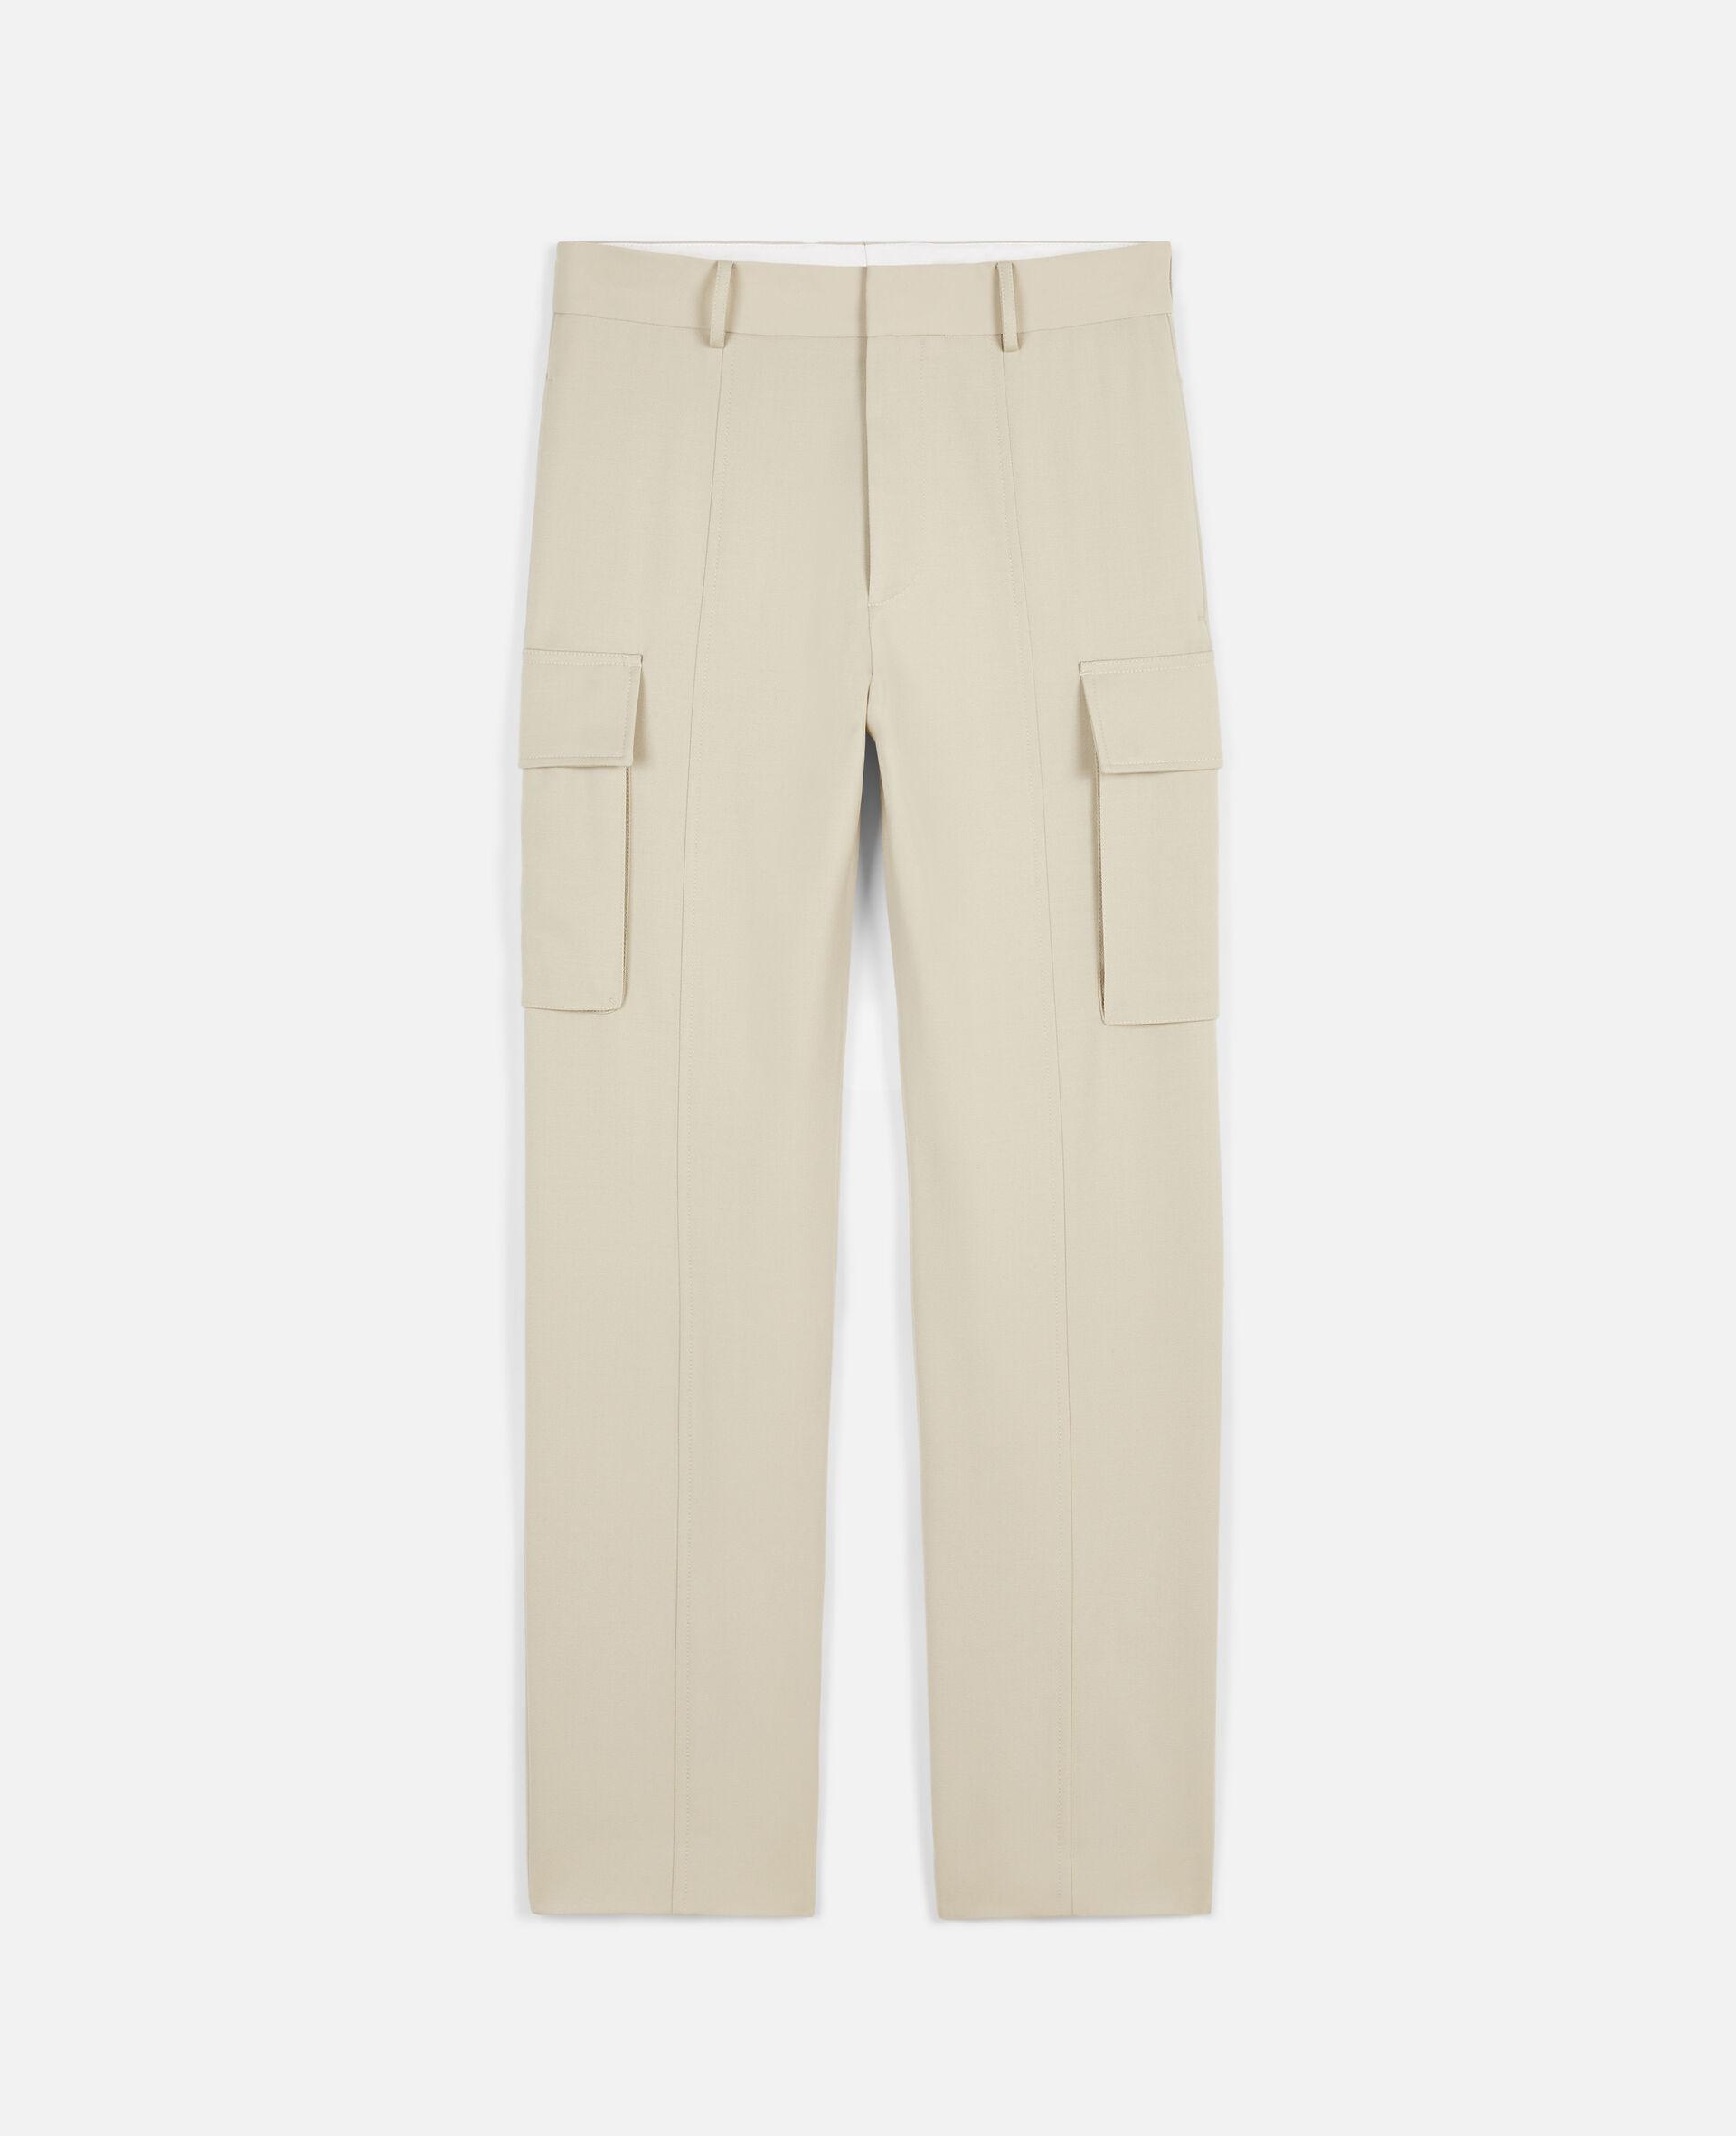 浅沙色裤装-米色-large image number 0